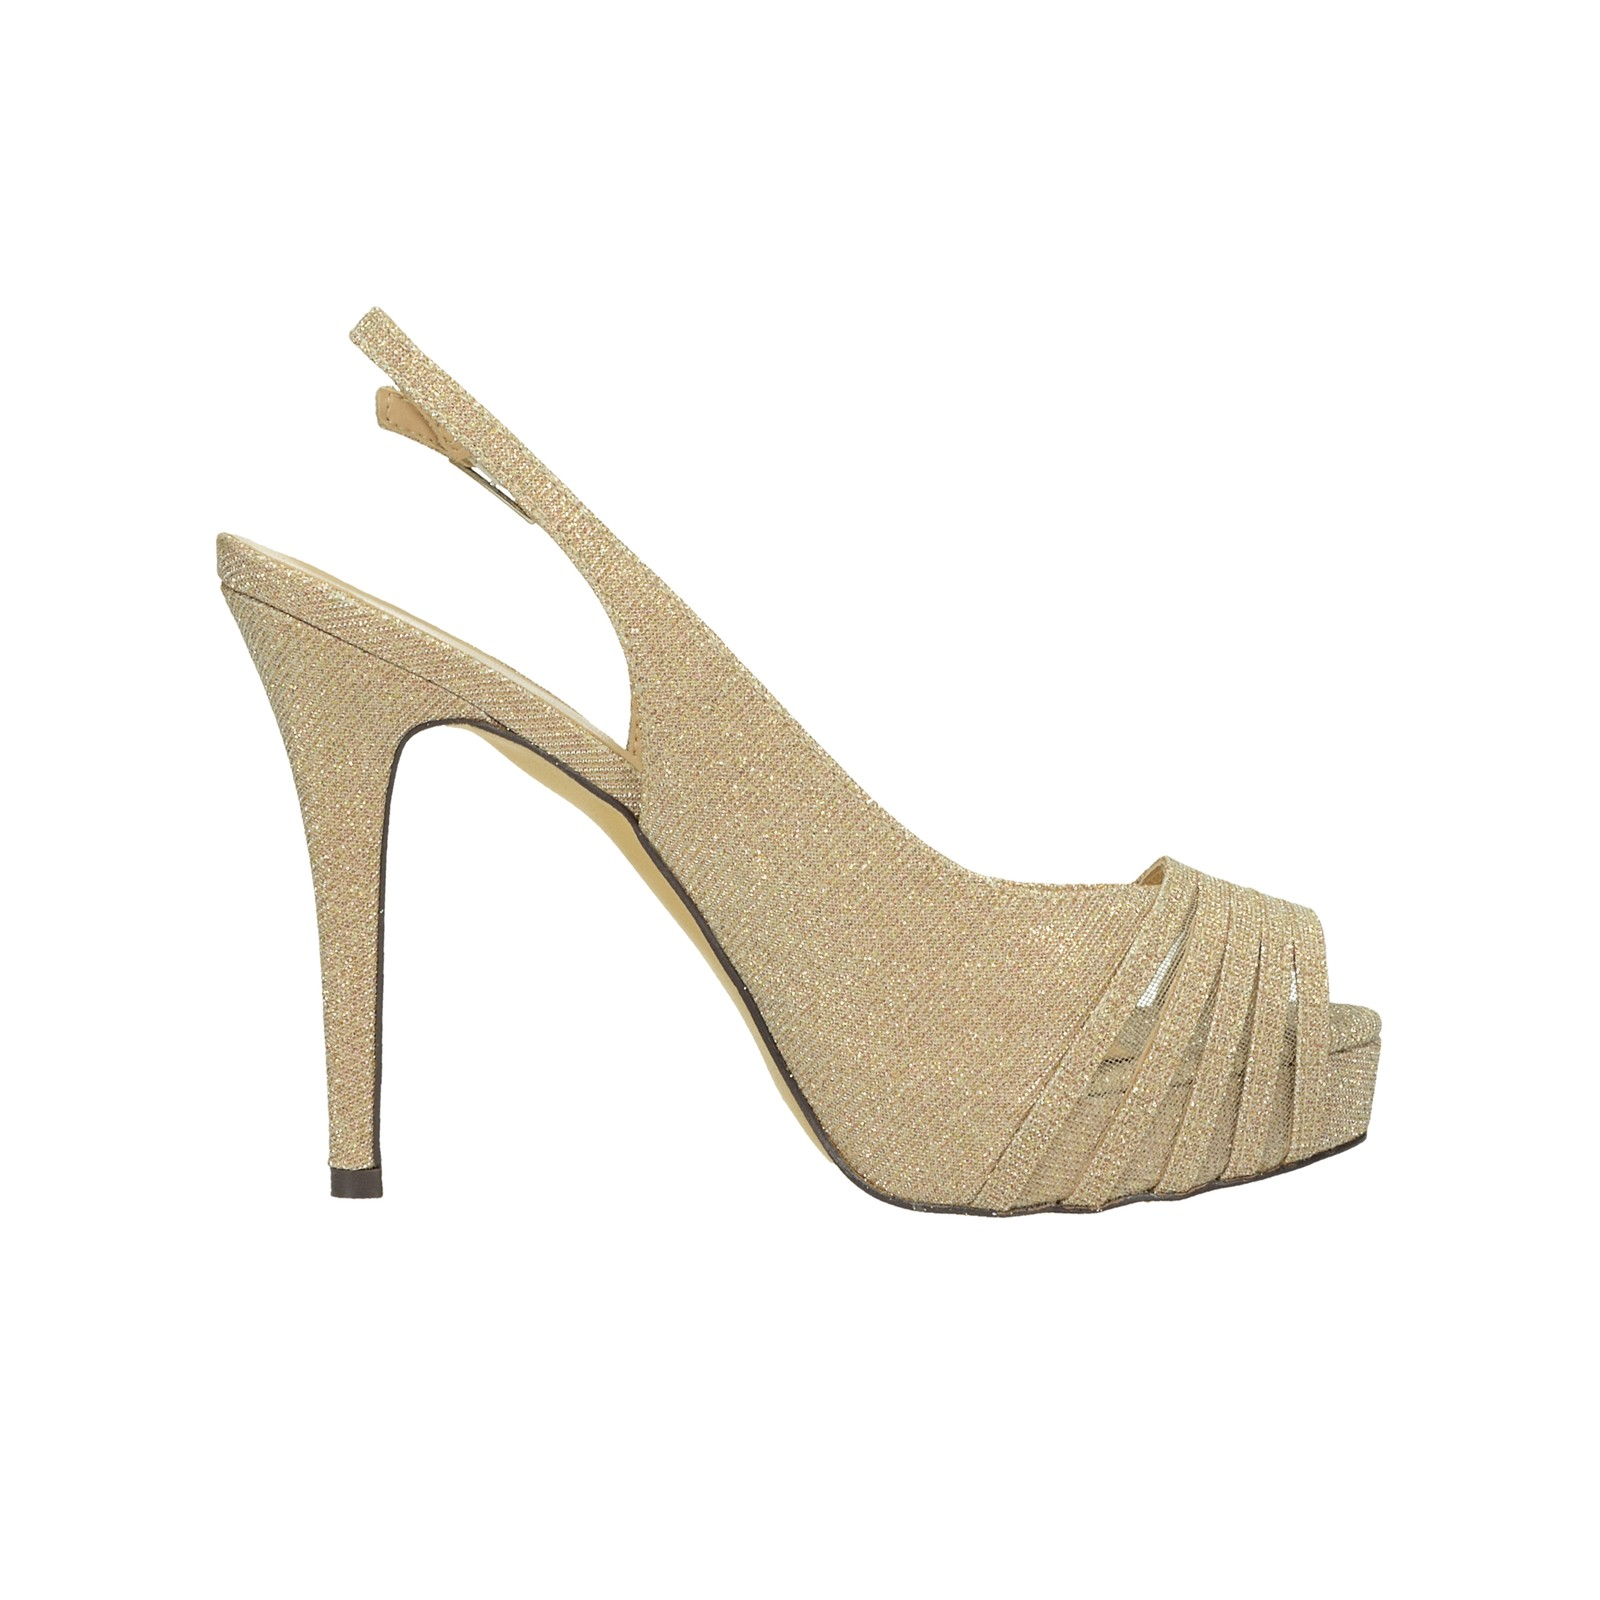 Menbur dámske spoločenské sandále - zlaté